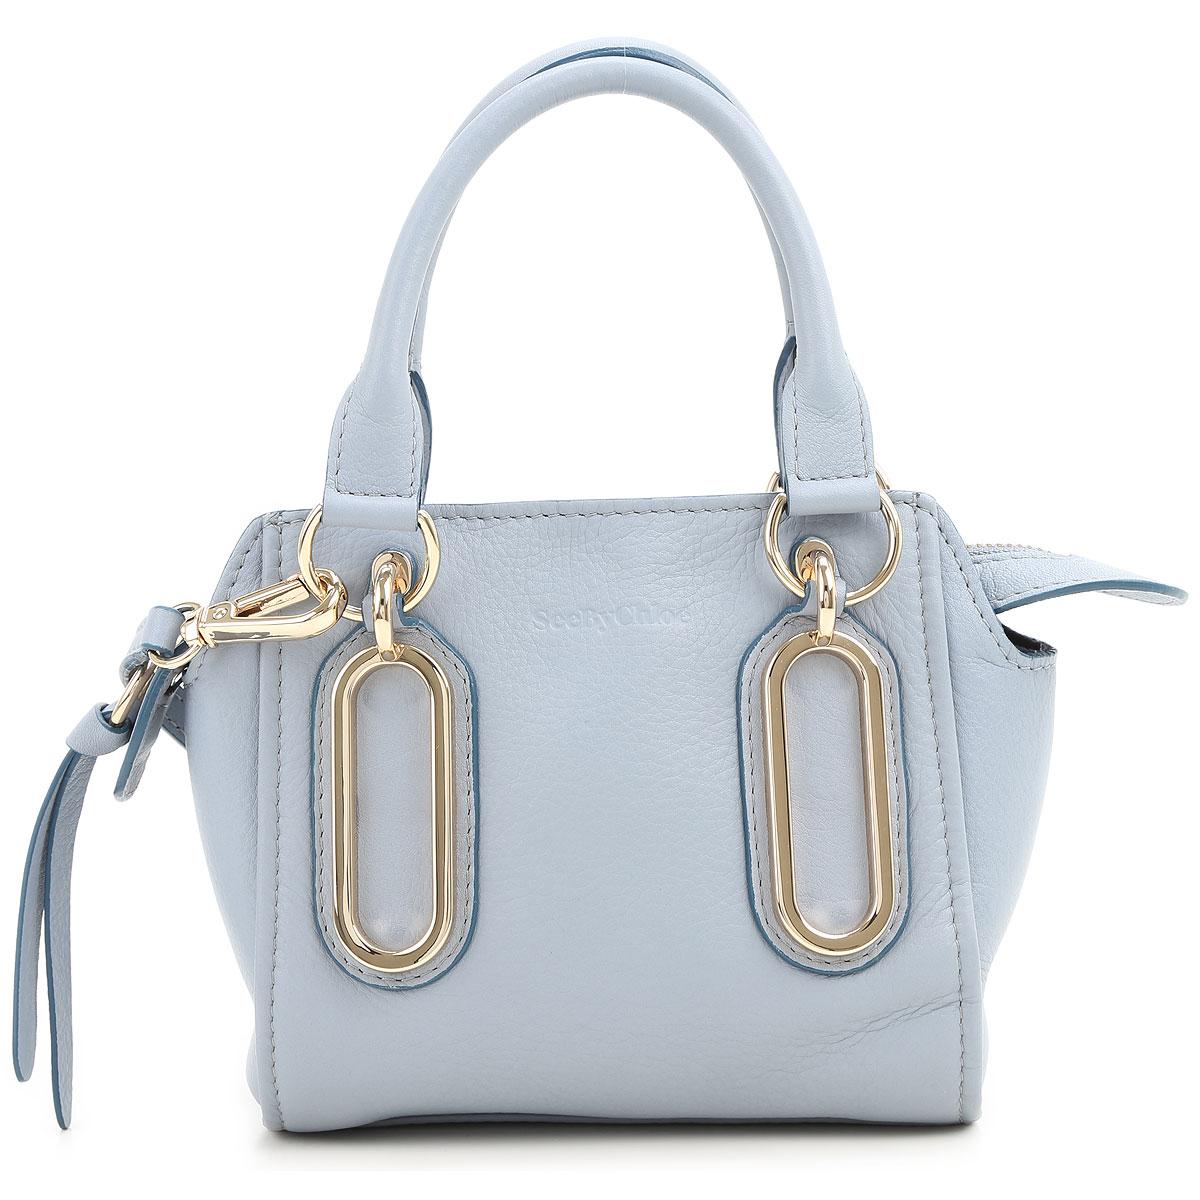 Chloe Tote Bag, Azure, Leather, 2017 USA-355300